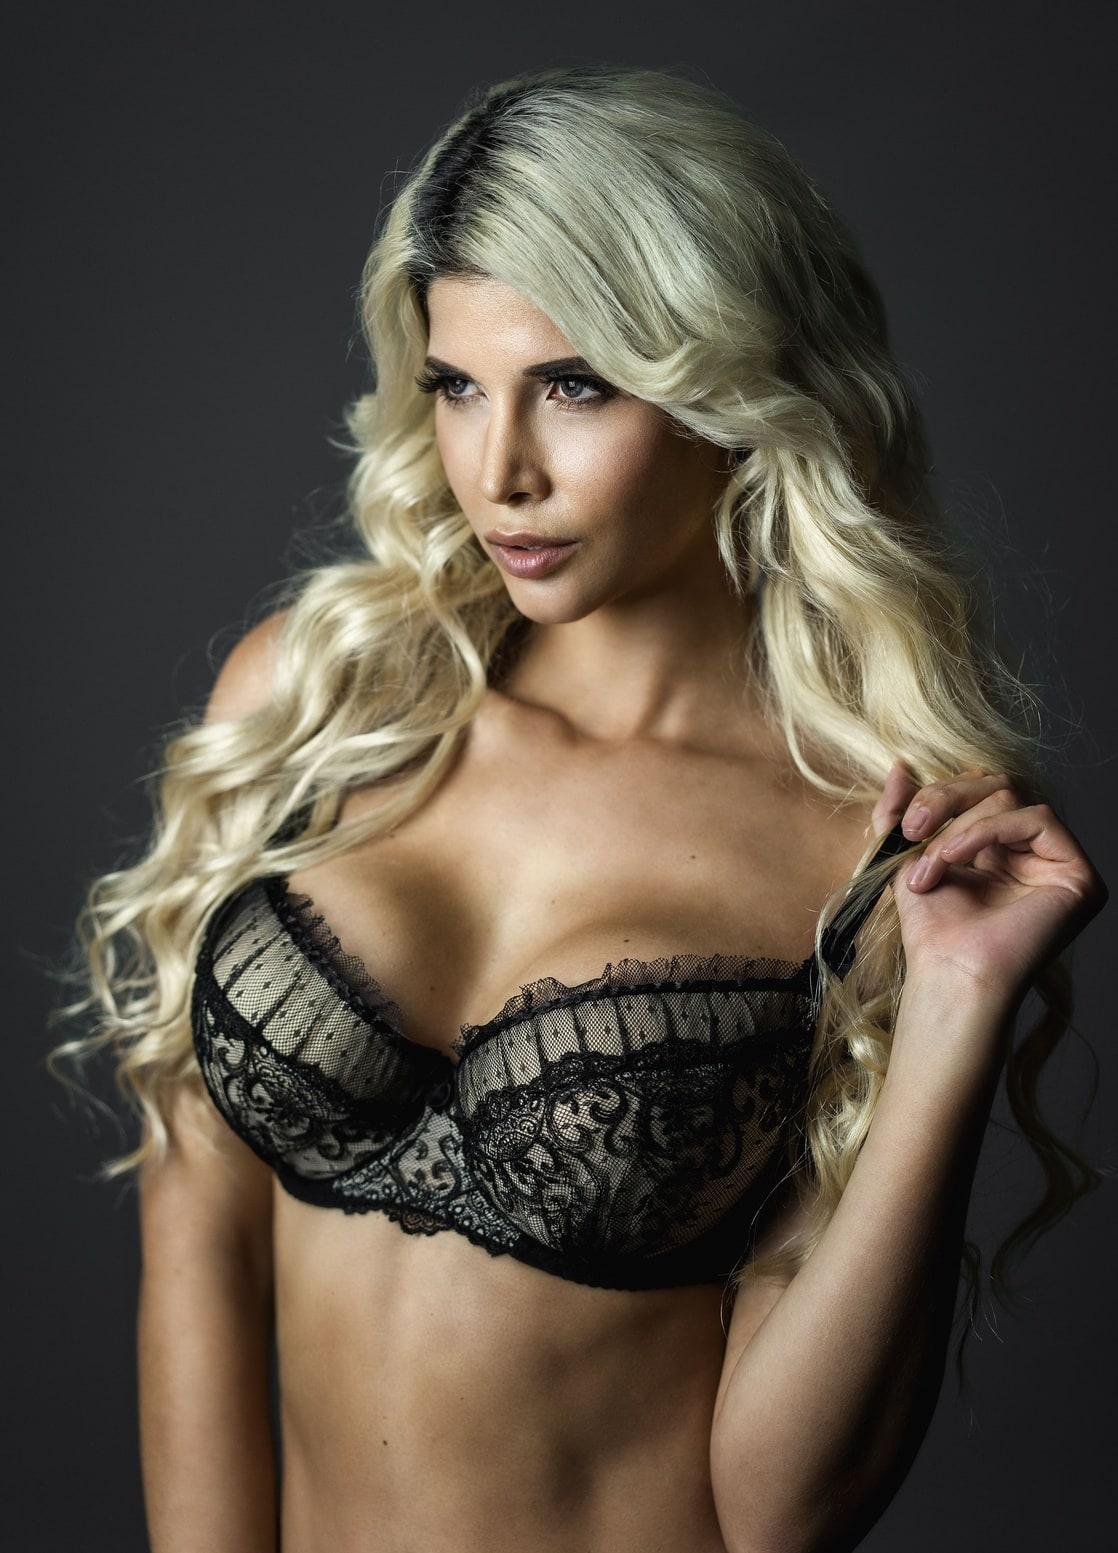 2019 Micaela Schafer nudes (48 photo), Ass, Sideboobs, Boobs, bra 2018